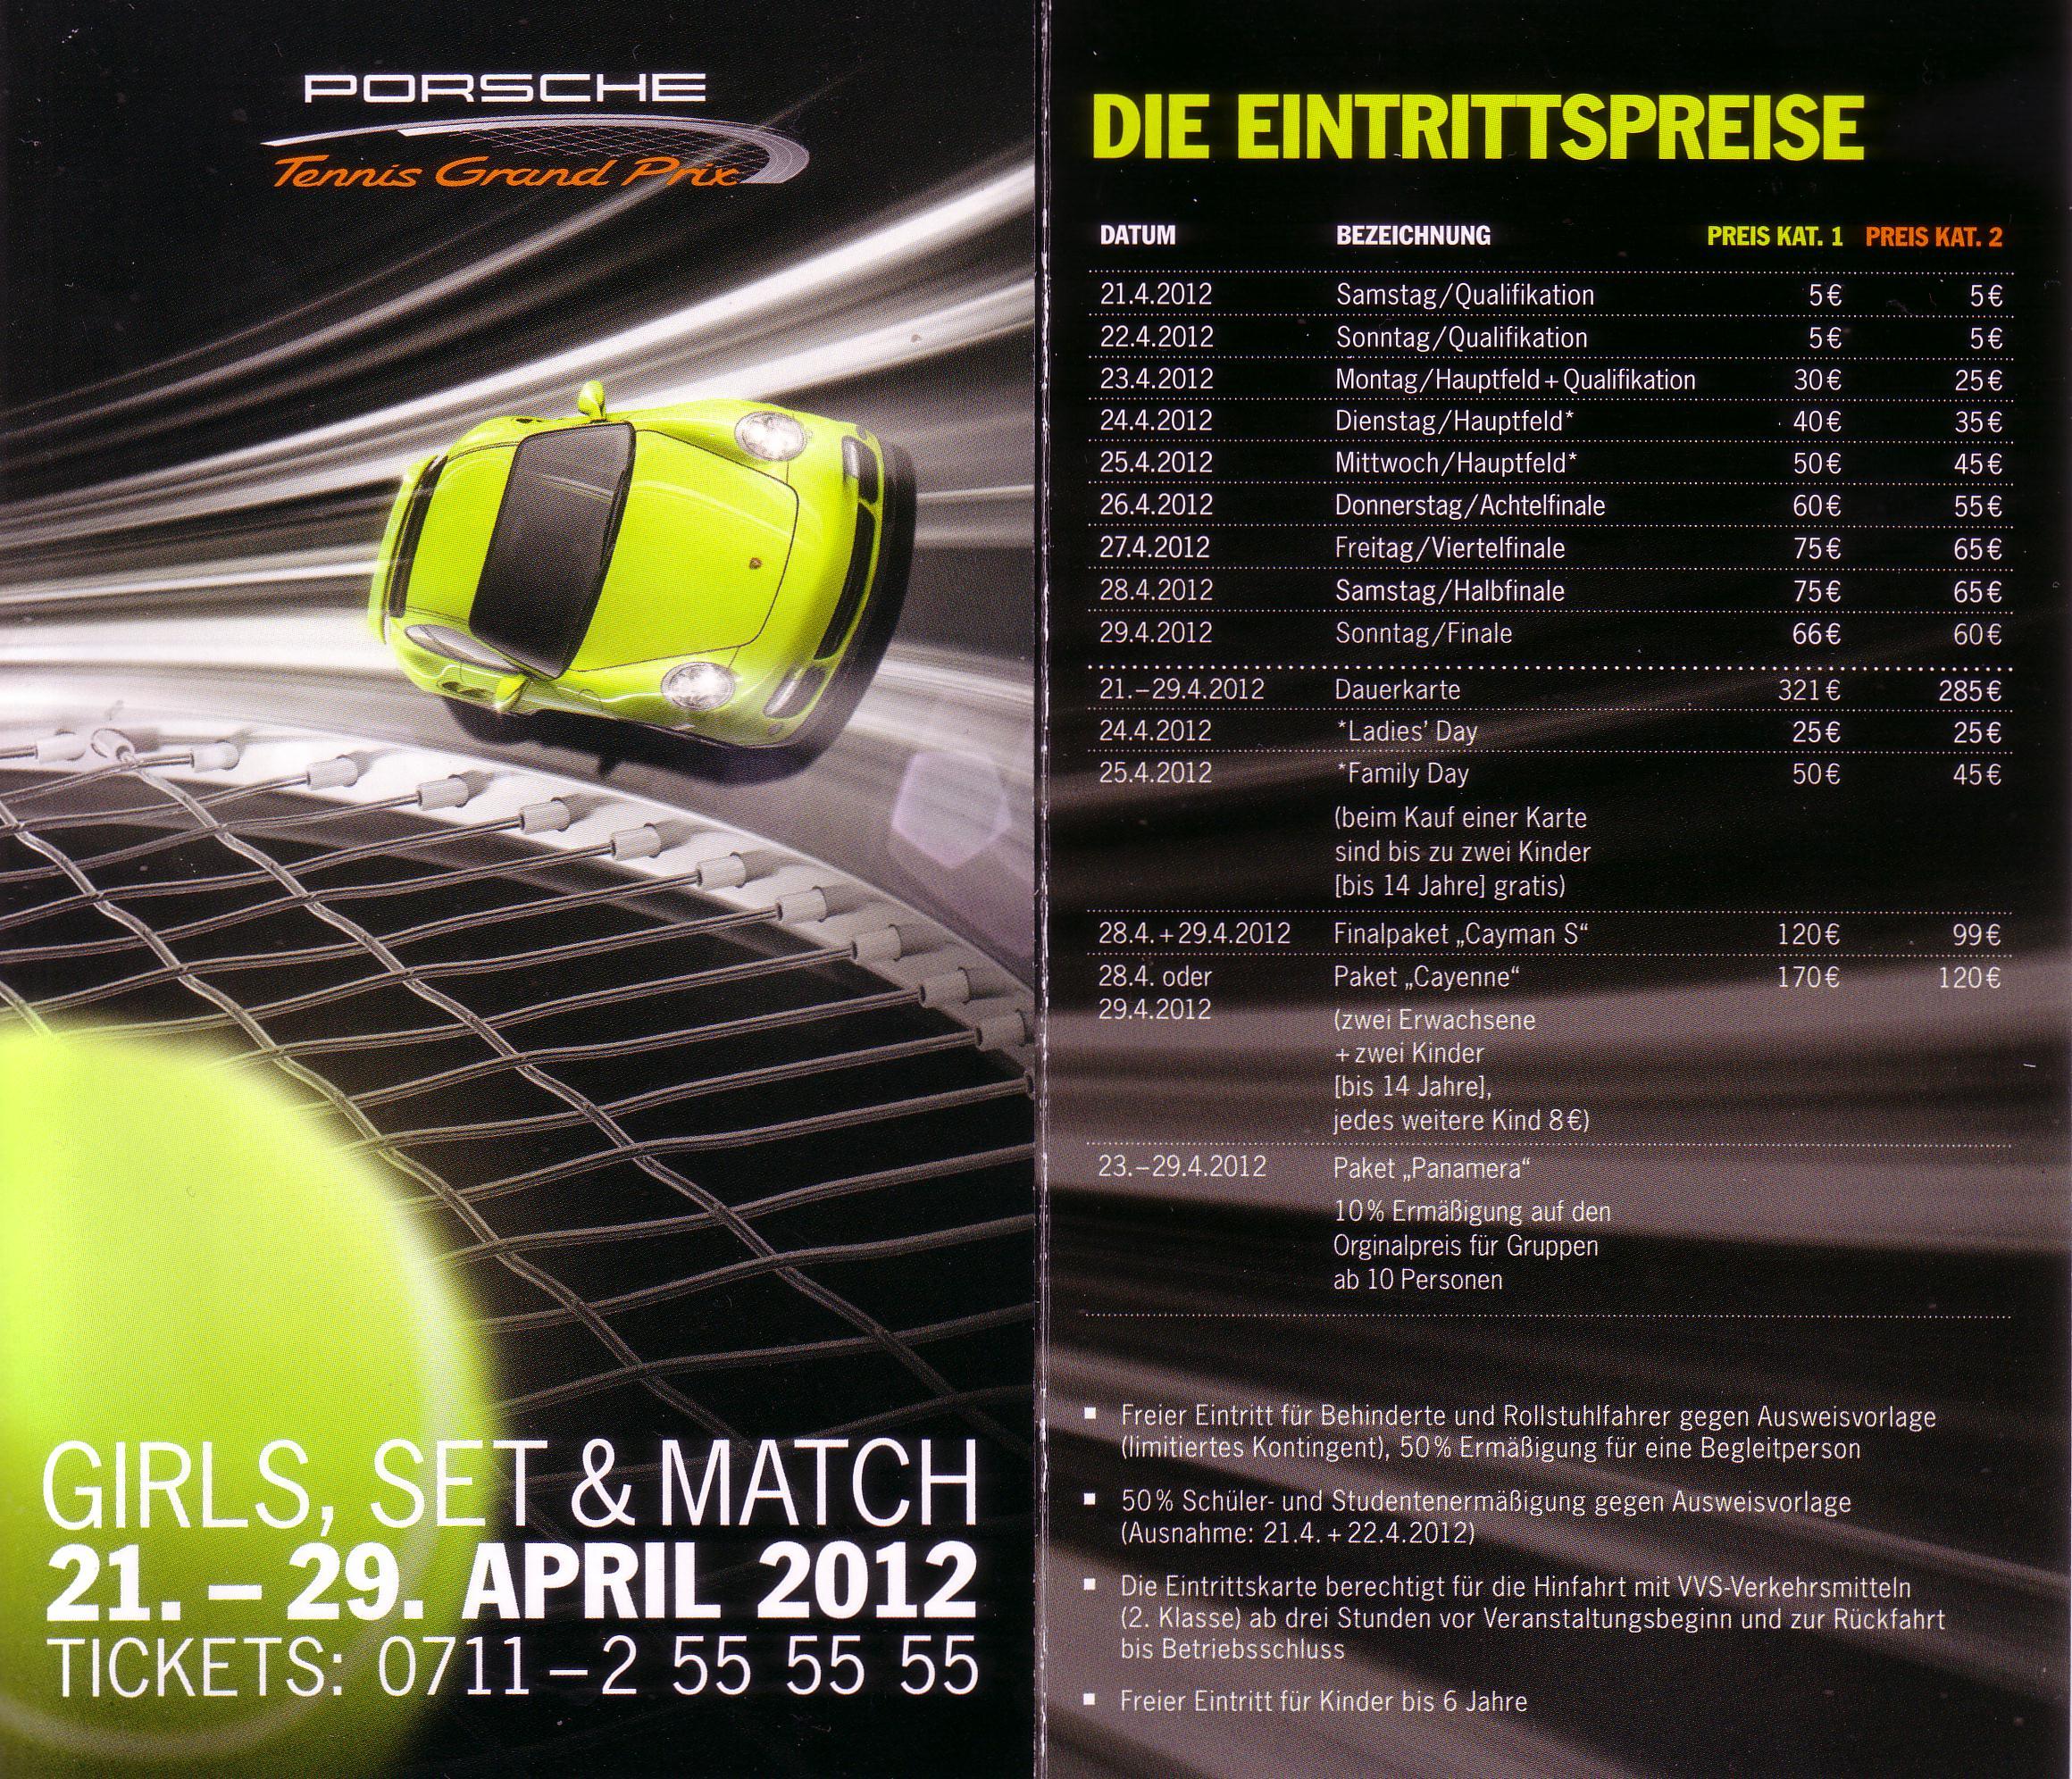 Porsche Tennis Grand Prix 2012